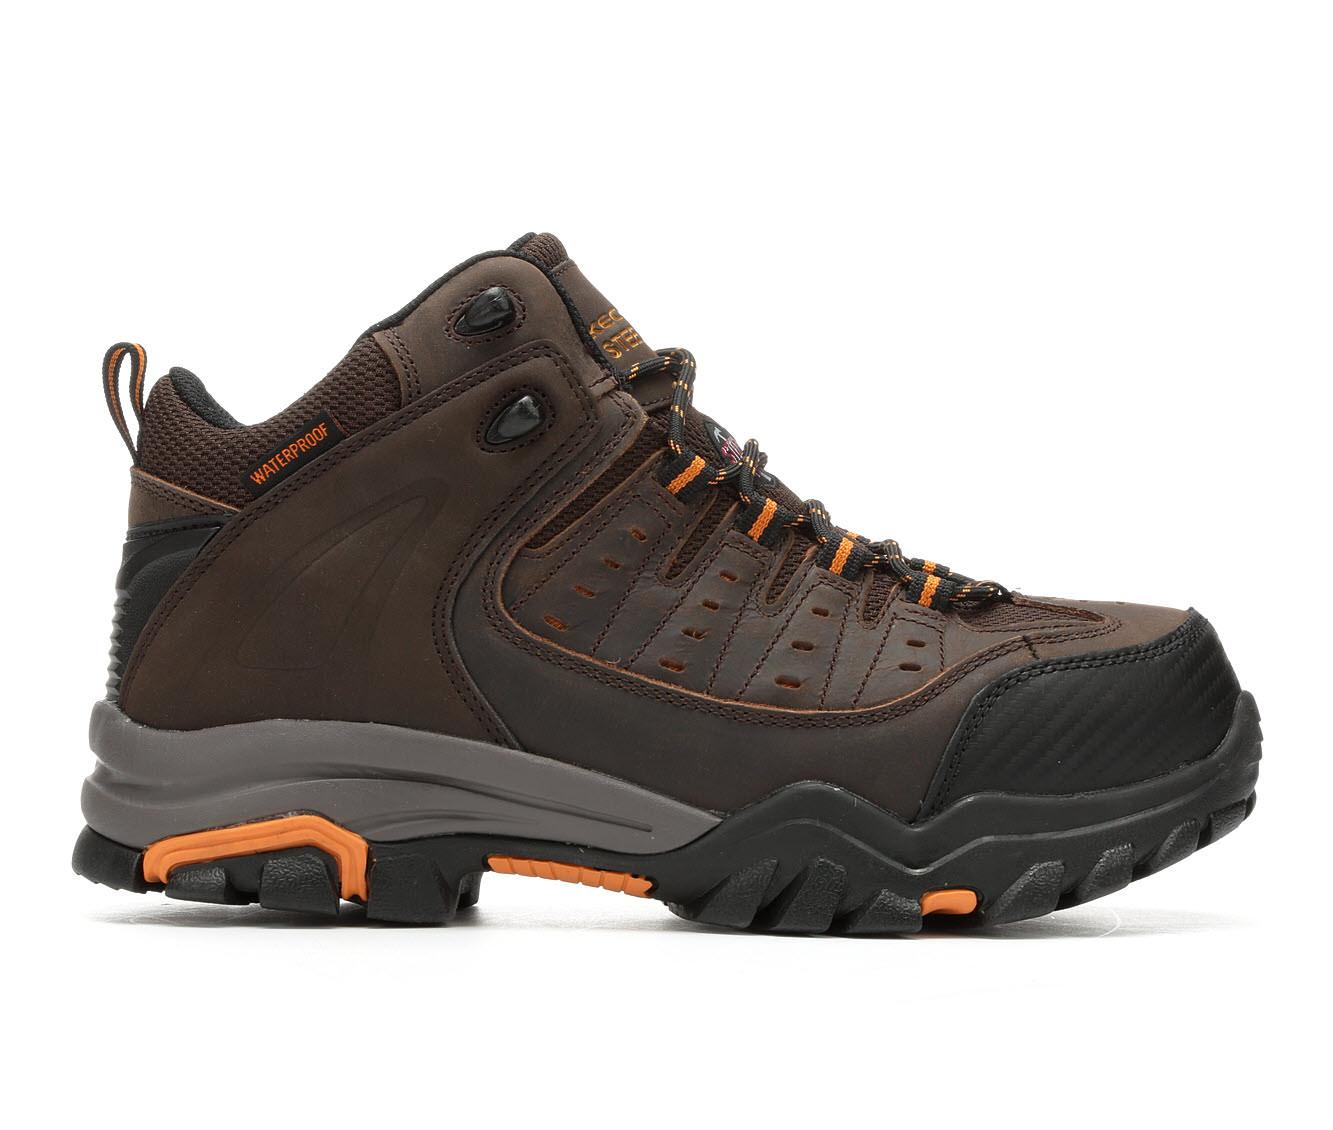 Skechers Work Lakehead Waterproof Steel Toe 77126 Men's Boots (Brown Leather)